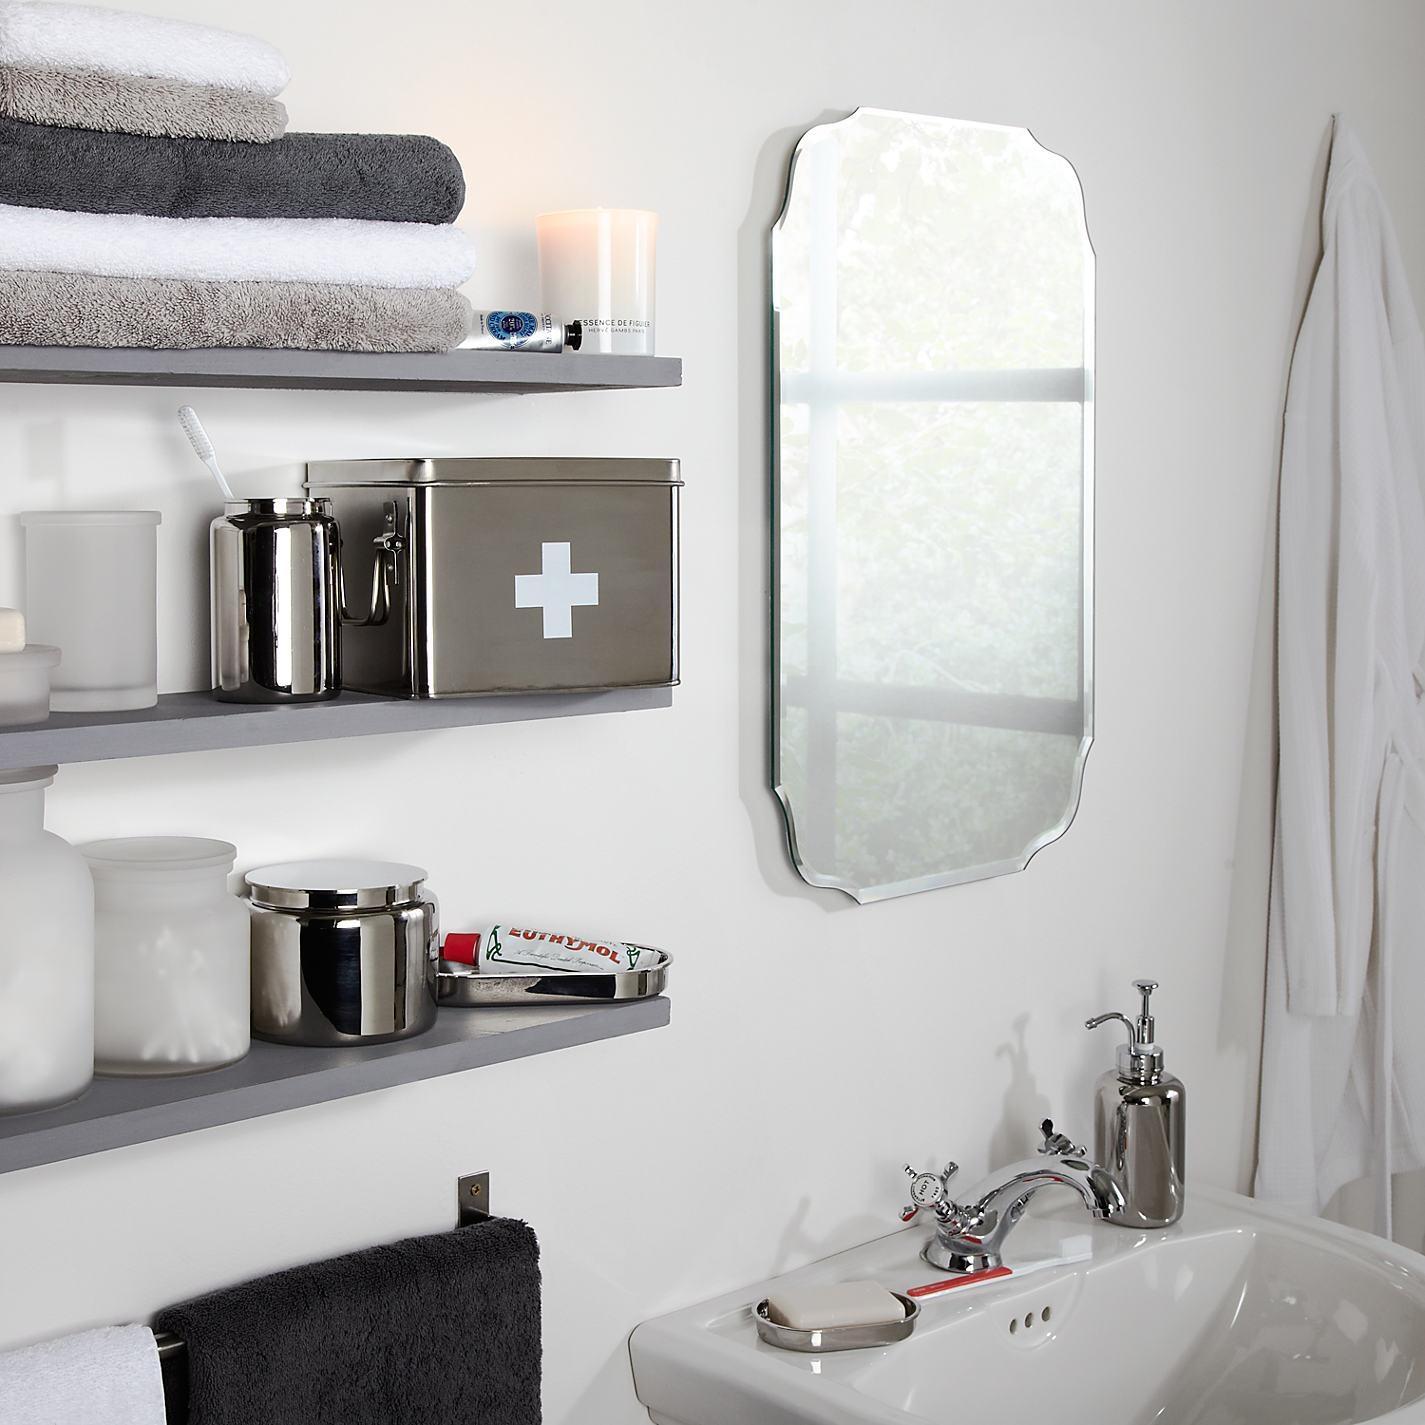 Featured Image of Retro Bathroom Mirror